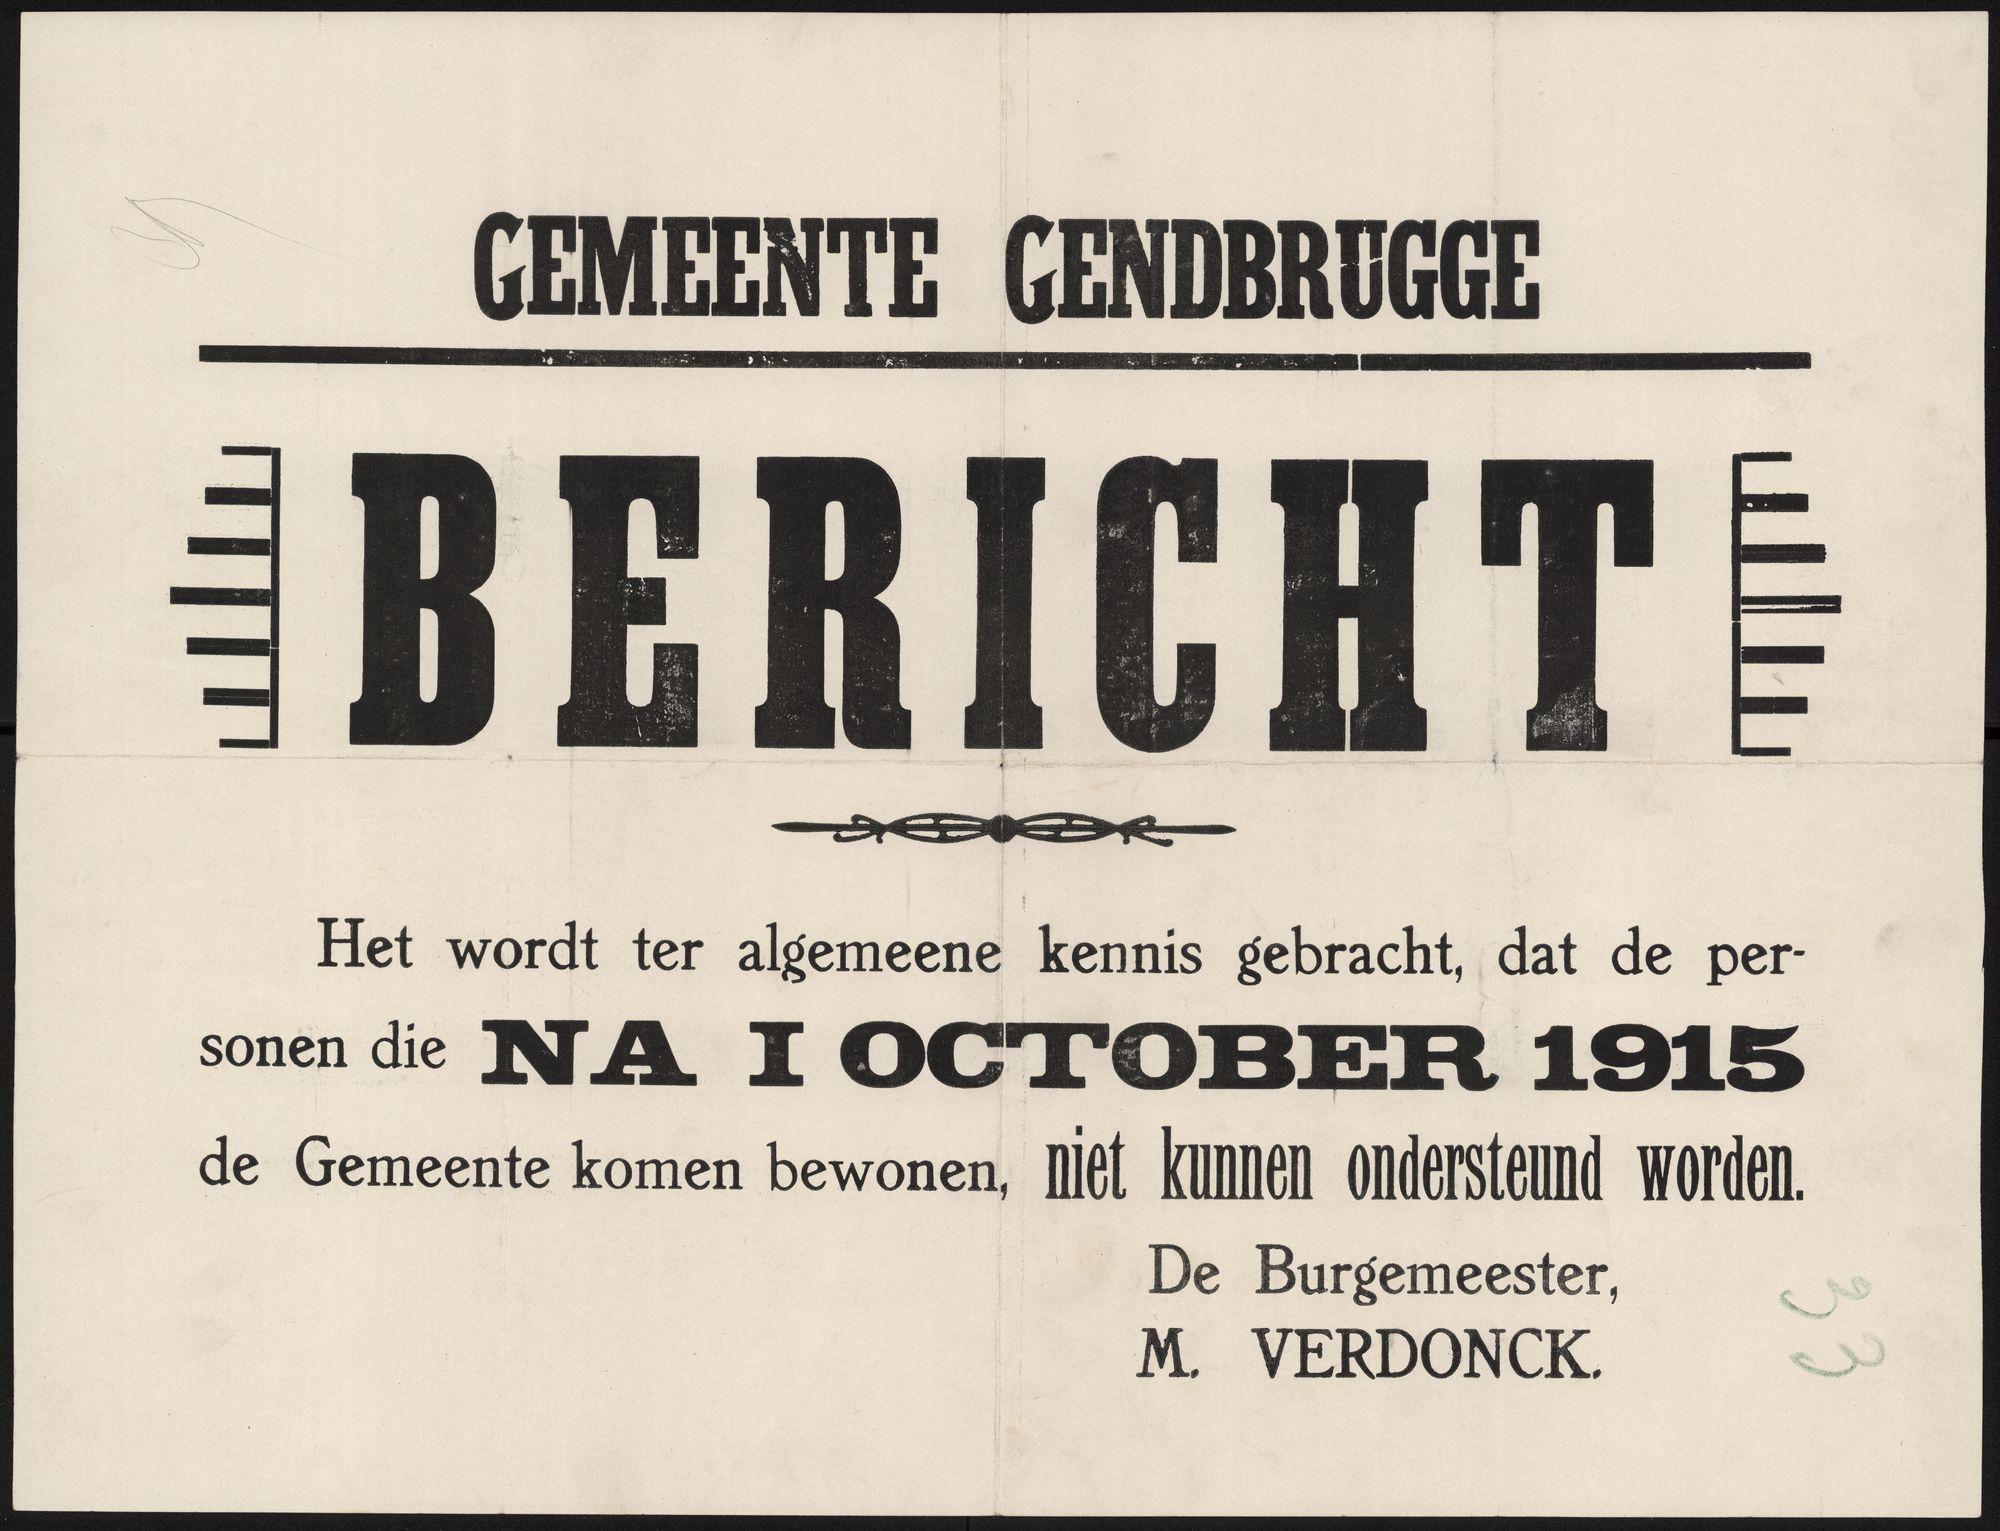 Gemeente Gendbrugge, Bericht.